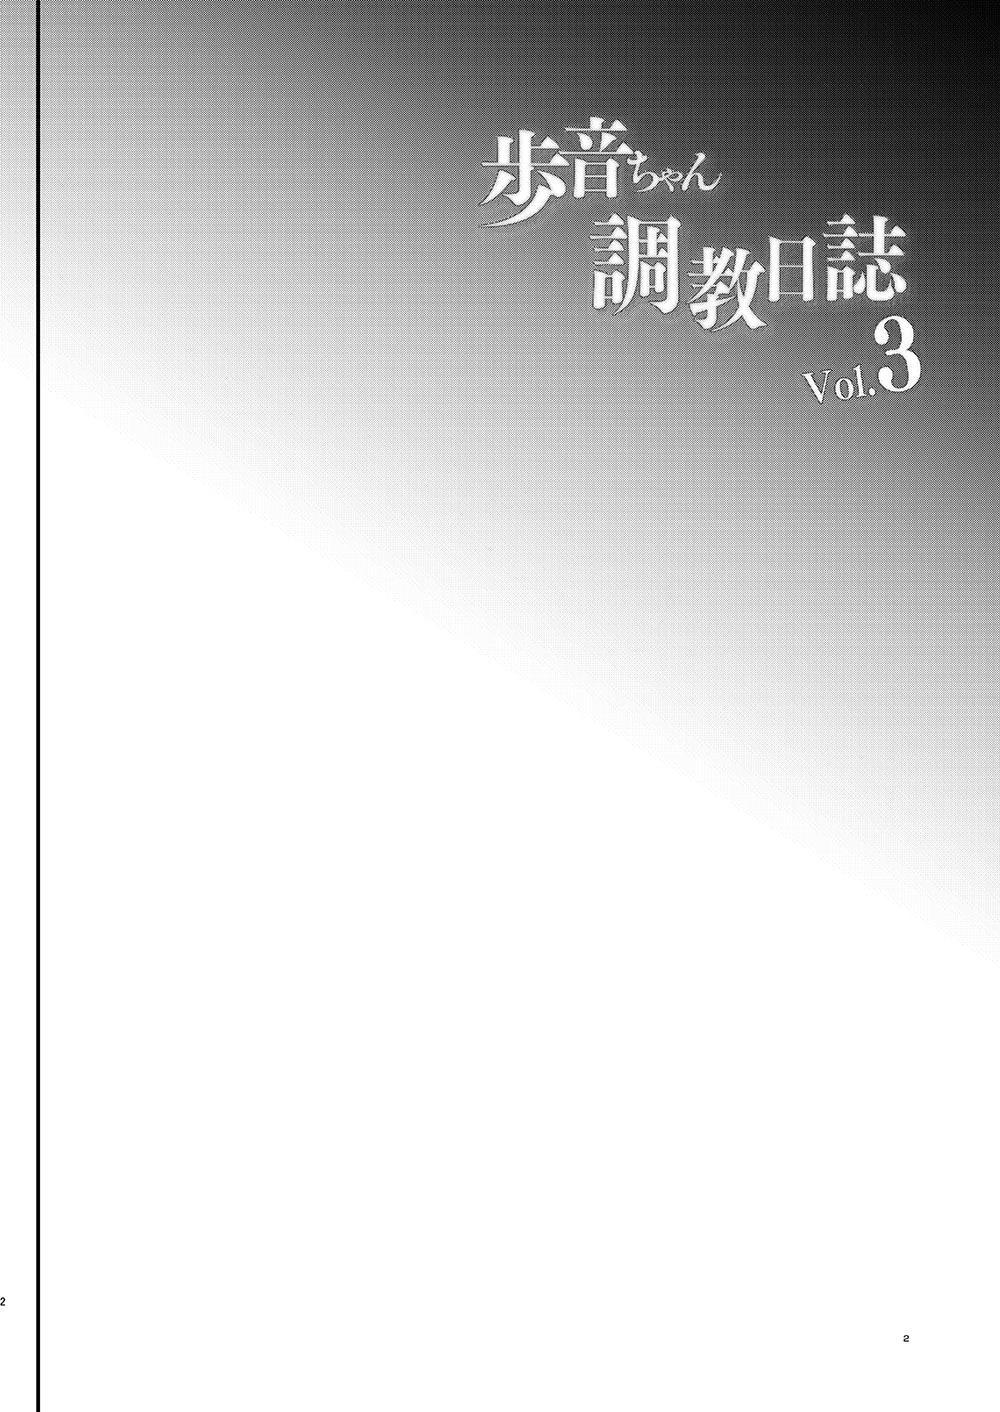 [Shimajiya (Shimaji)] Ayune-chan Choukyou Nisshi Vol. 3 -Gakkou Ecchi Hen- [Digital] 2